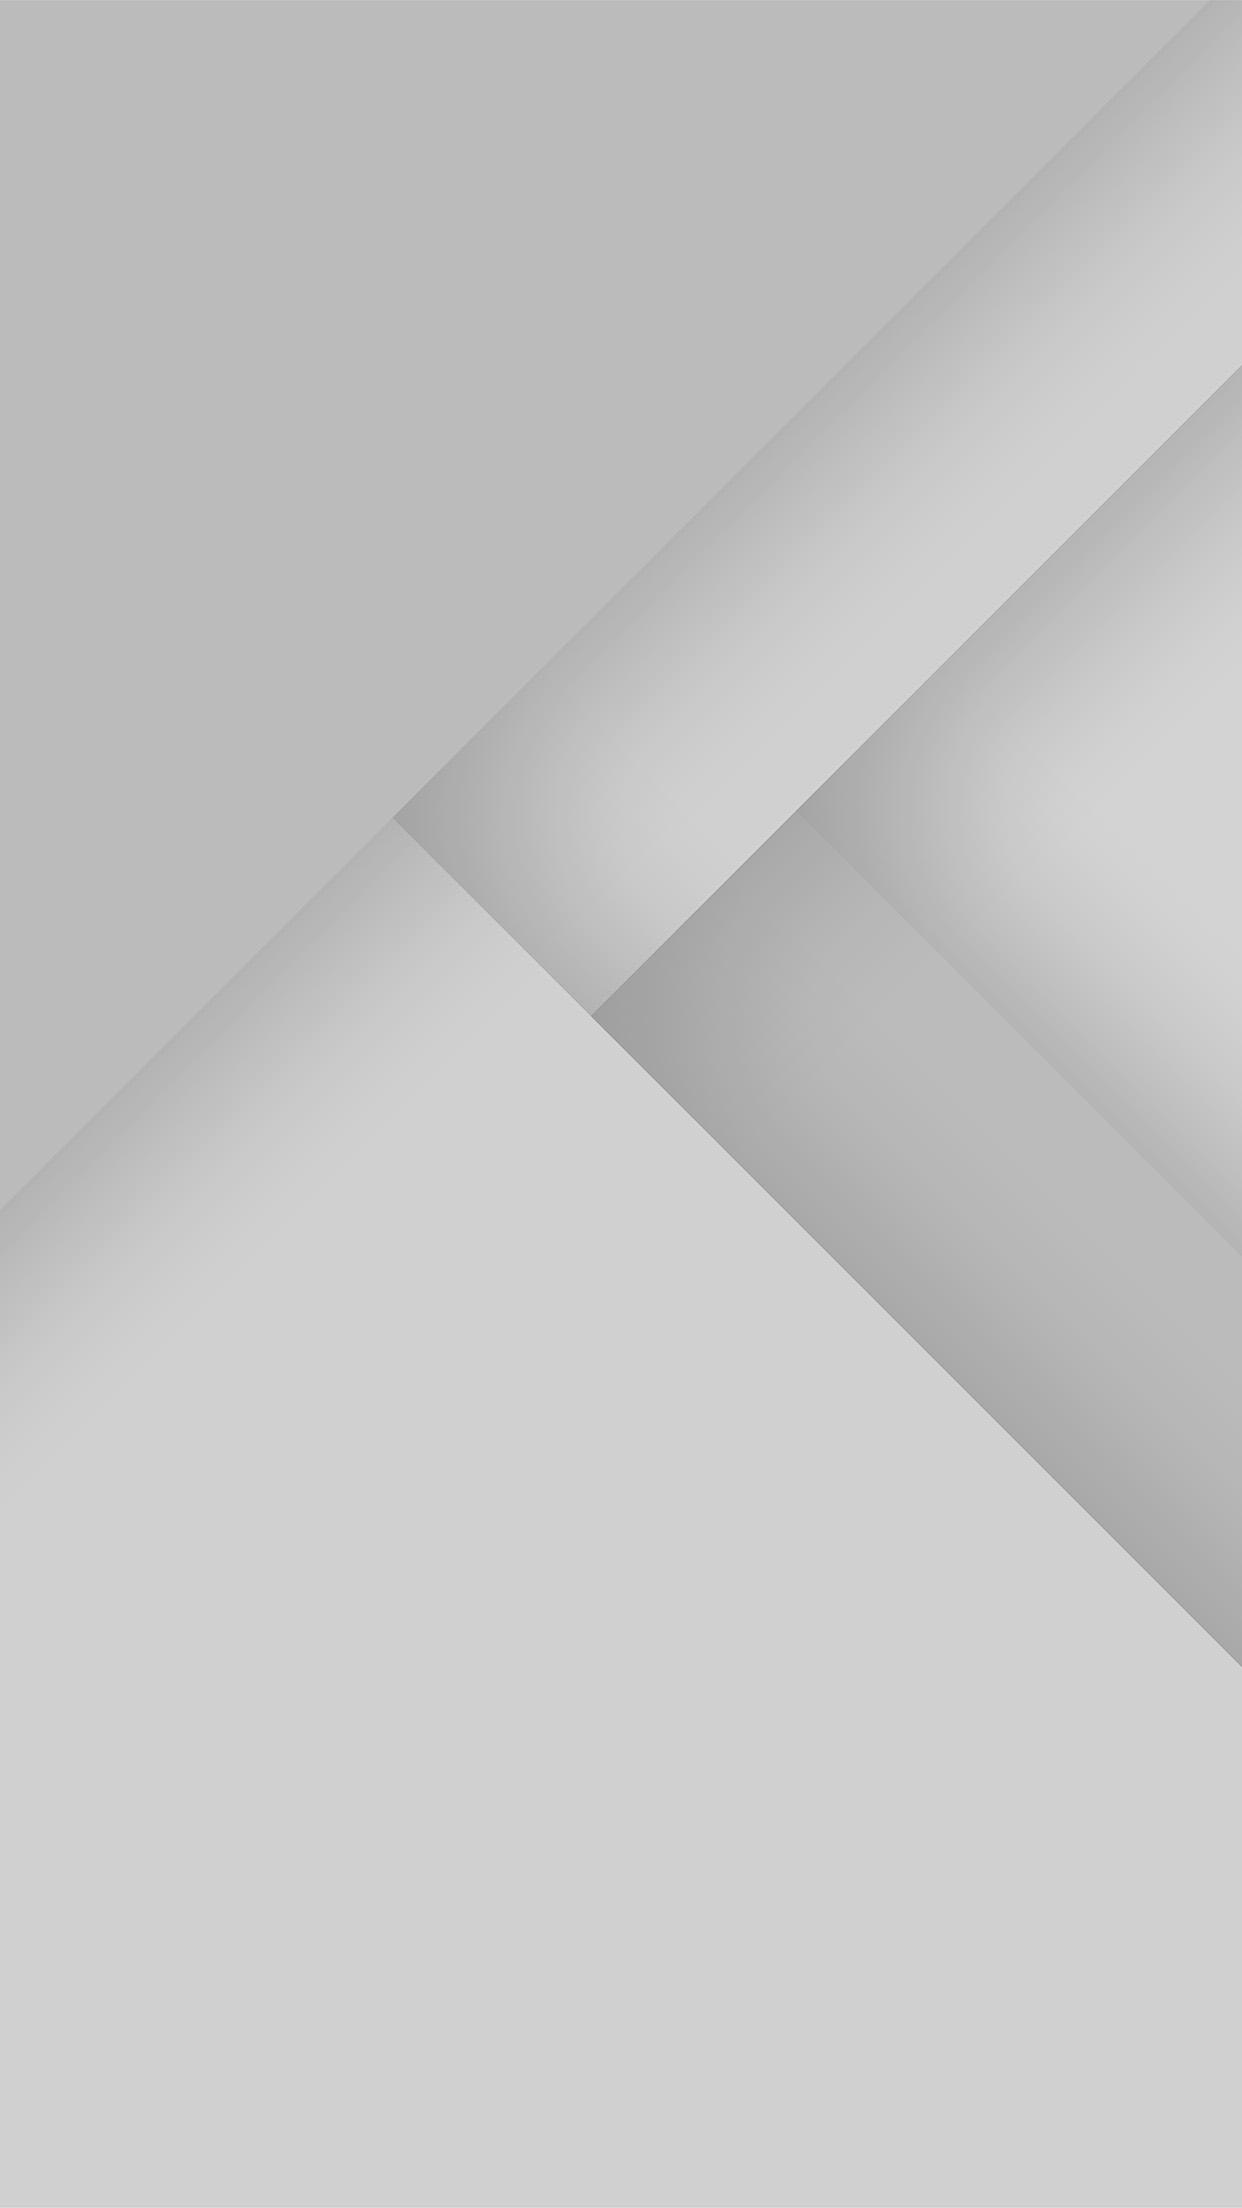 vk56-android-lollipop-material-design-white-pattern-wallpaper